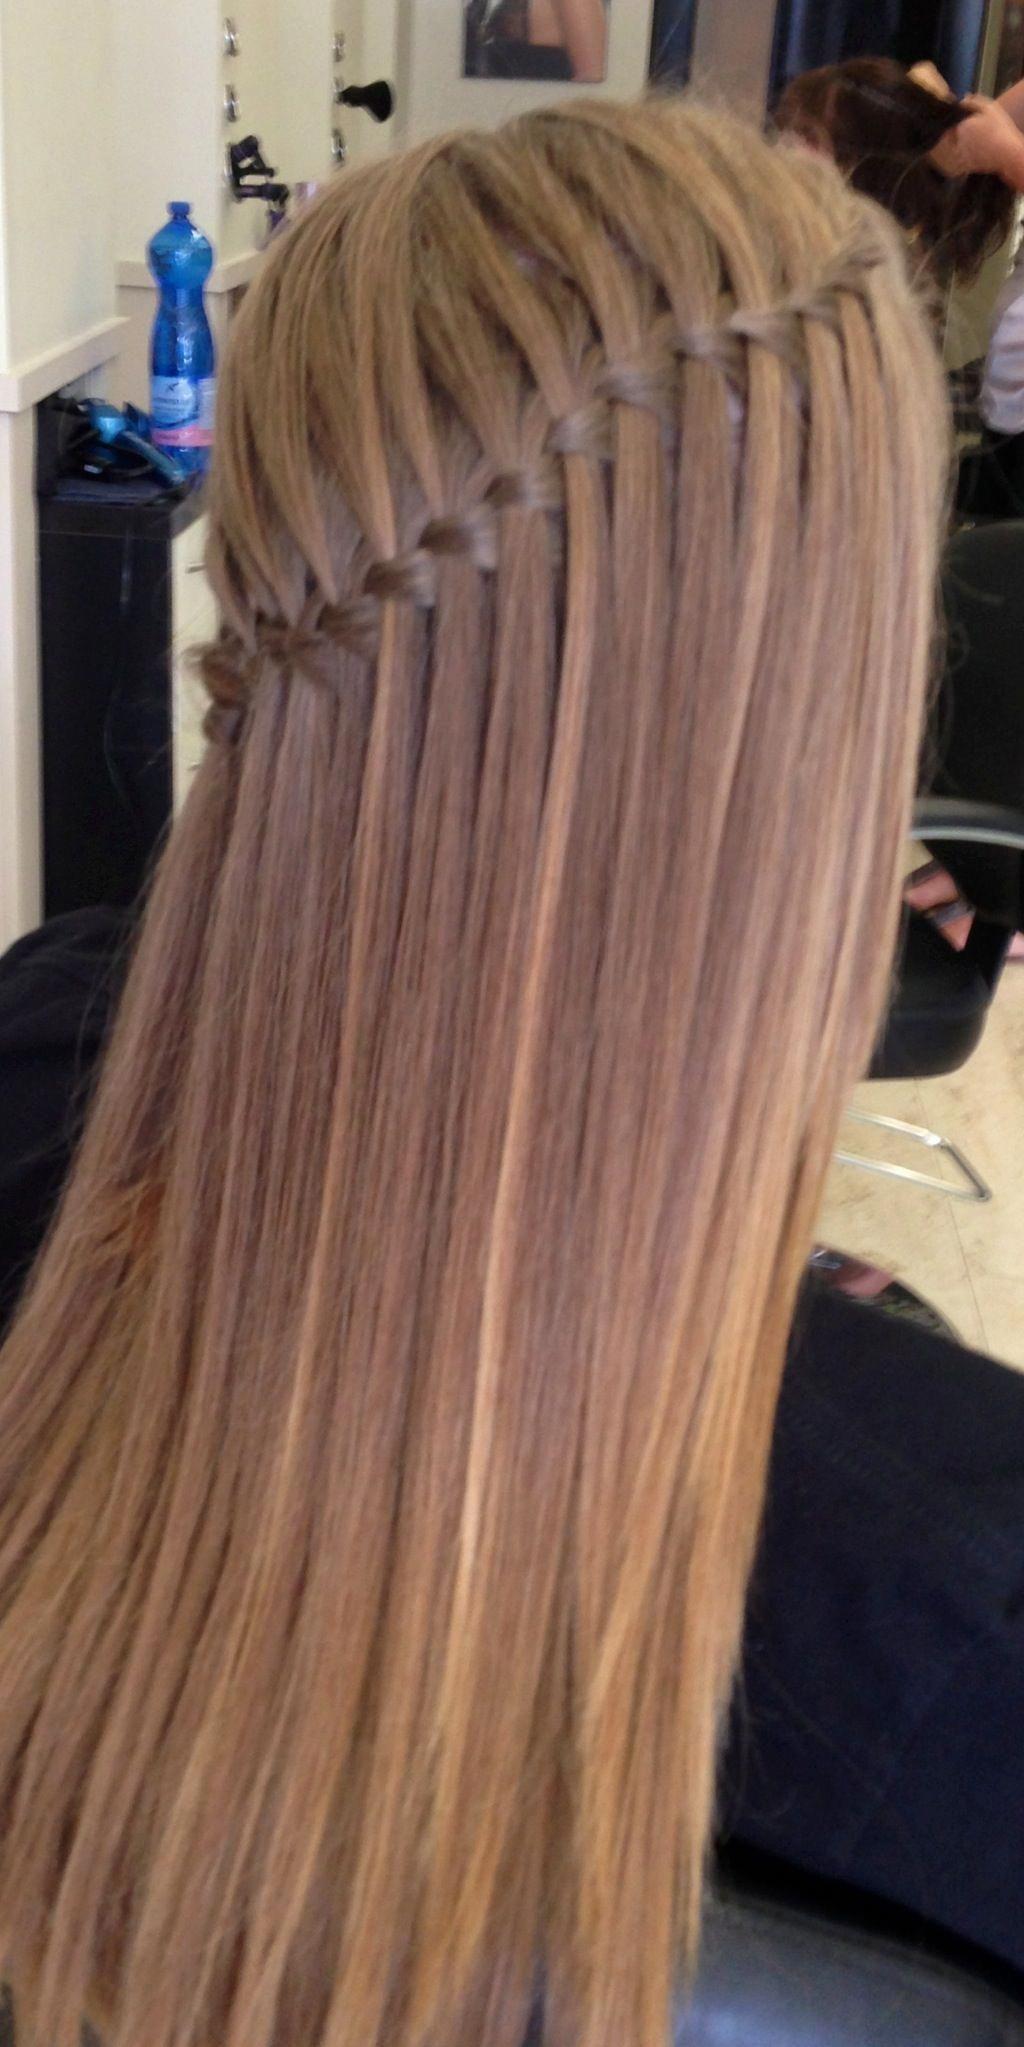 Hair Straightening Options Long Straightened Hair Prom Hairstyles Updos 20181223 Wig Hairstyles Weave Hairstyles Hair Styles